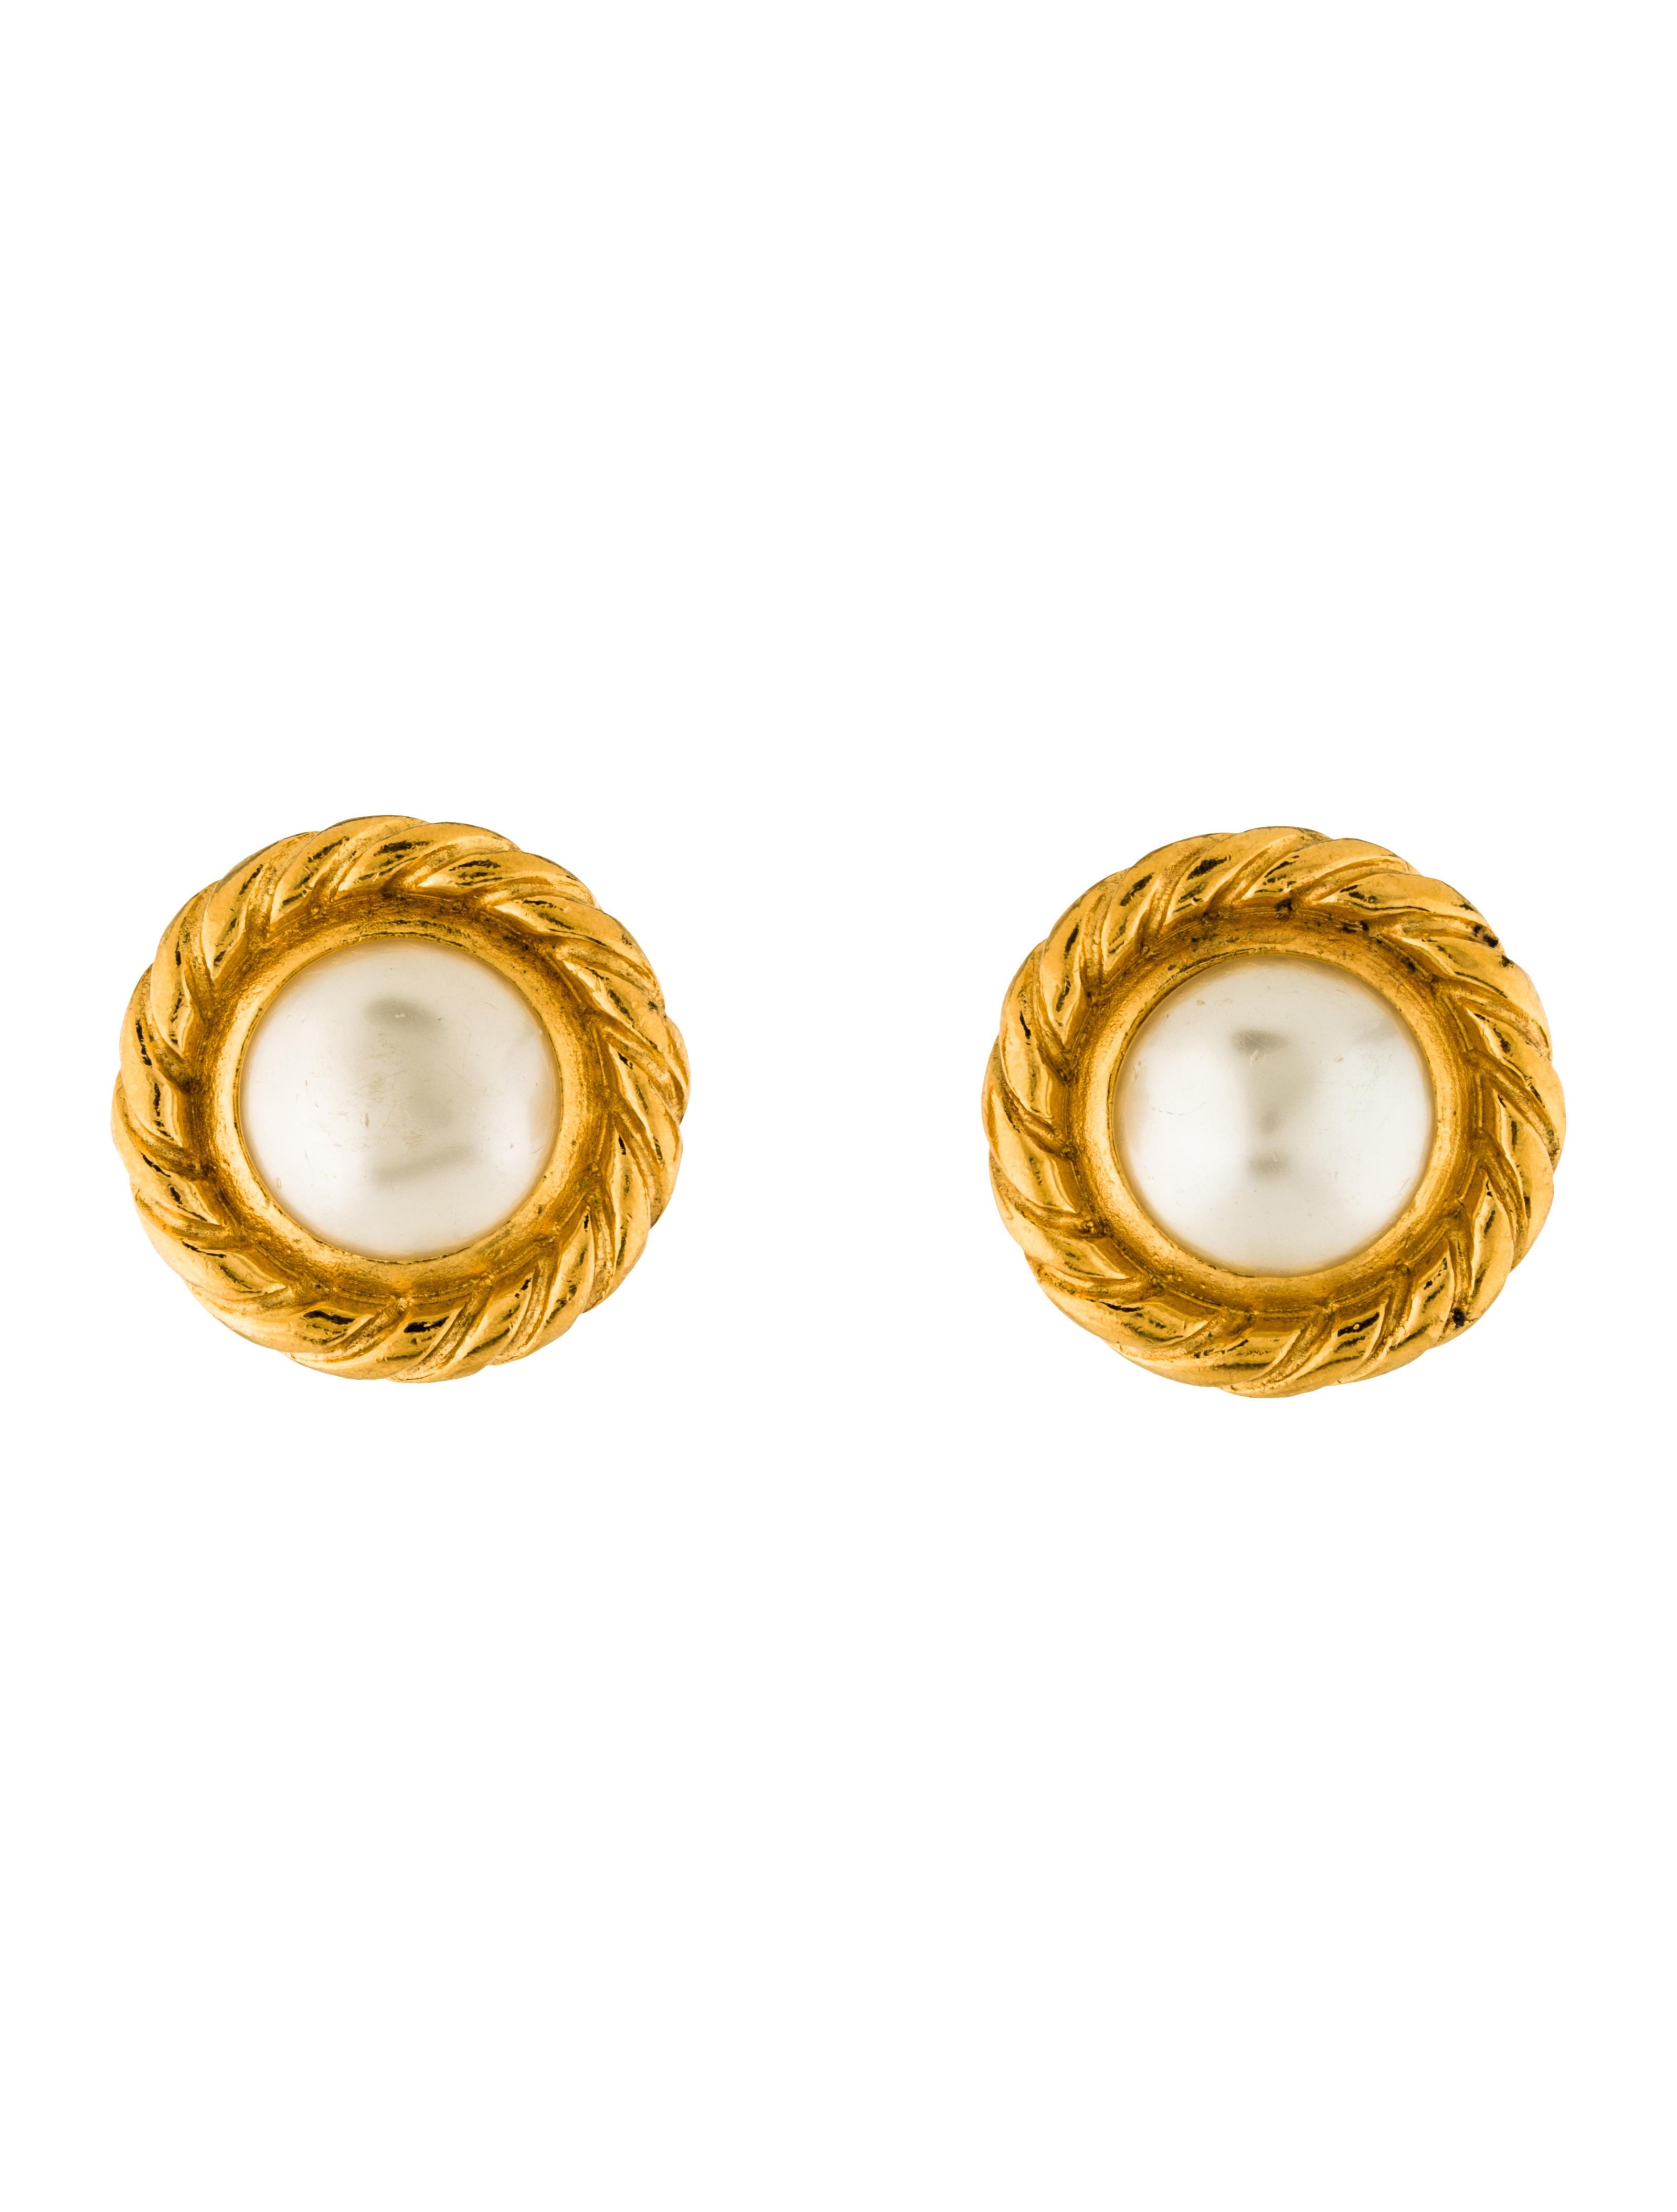 chanel faux pearl clip on earrings earrings cha189551. Black Bedroom Furniture Sets. Home Design Ideas